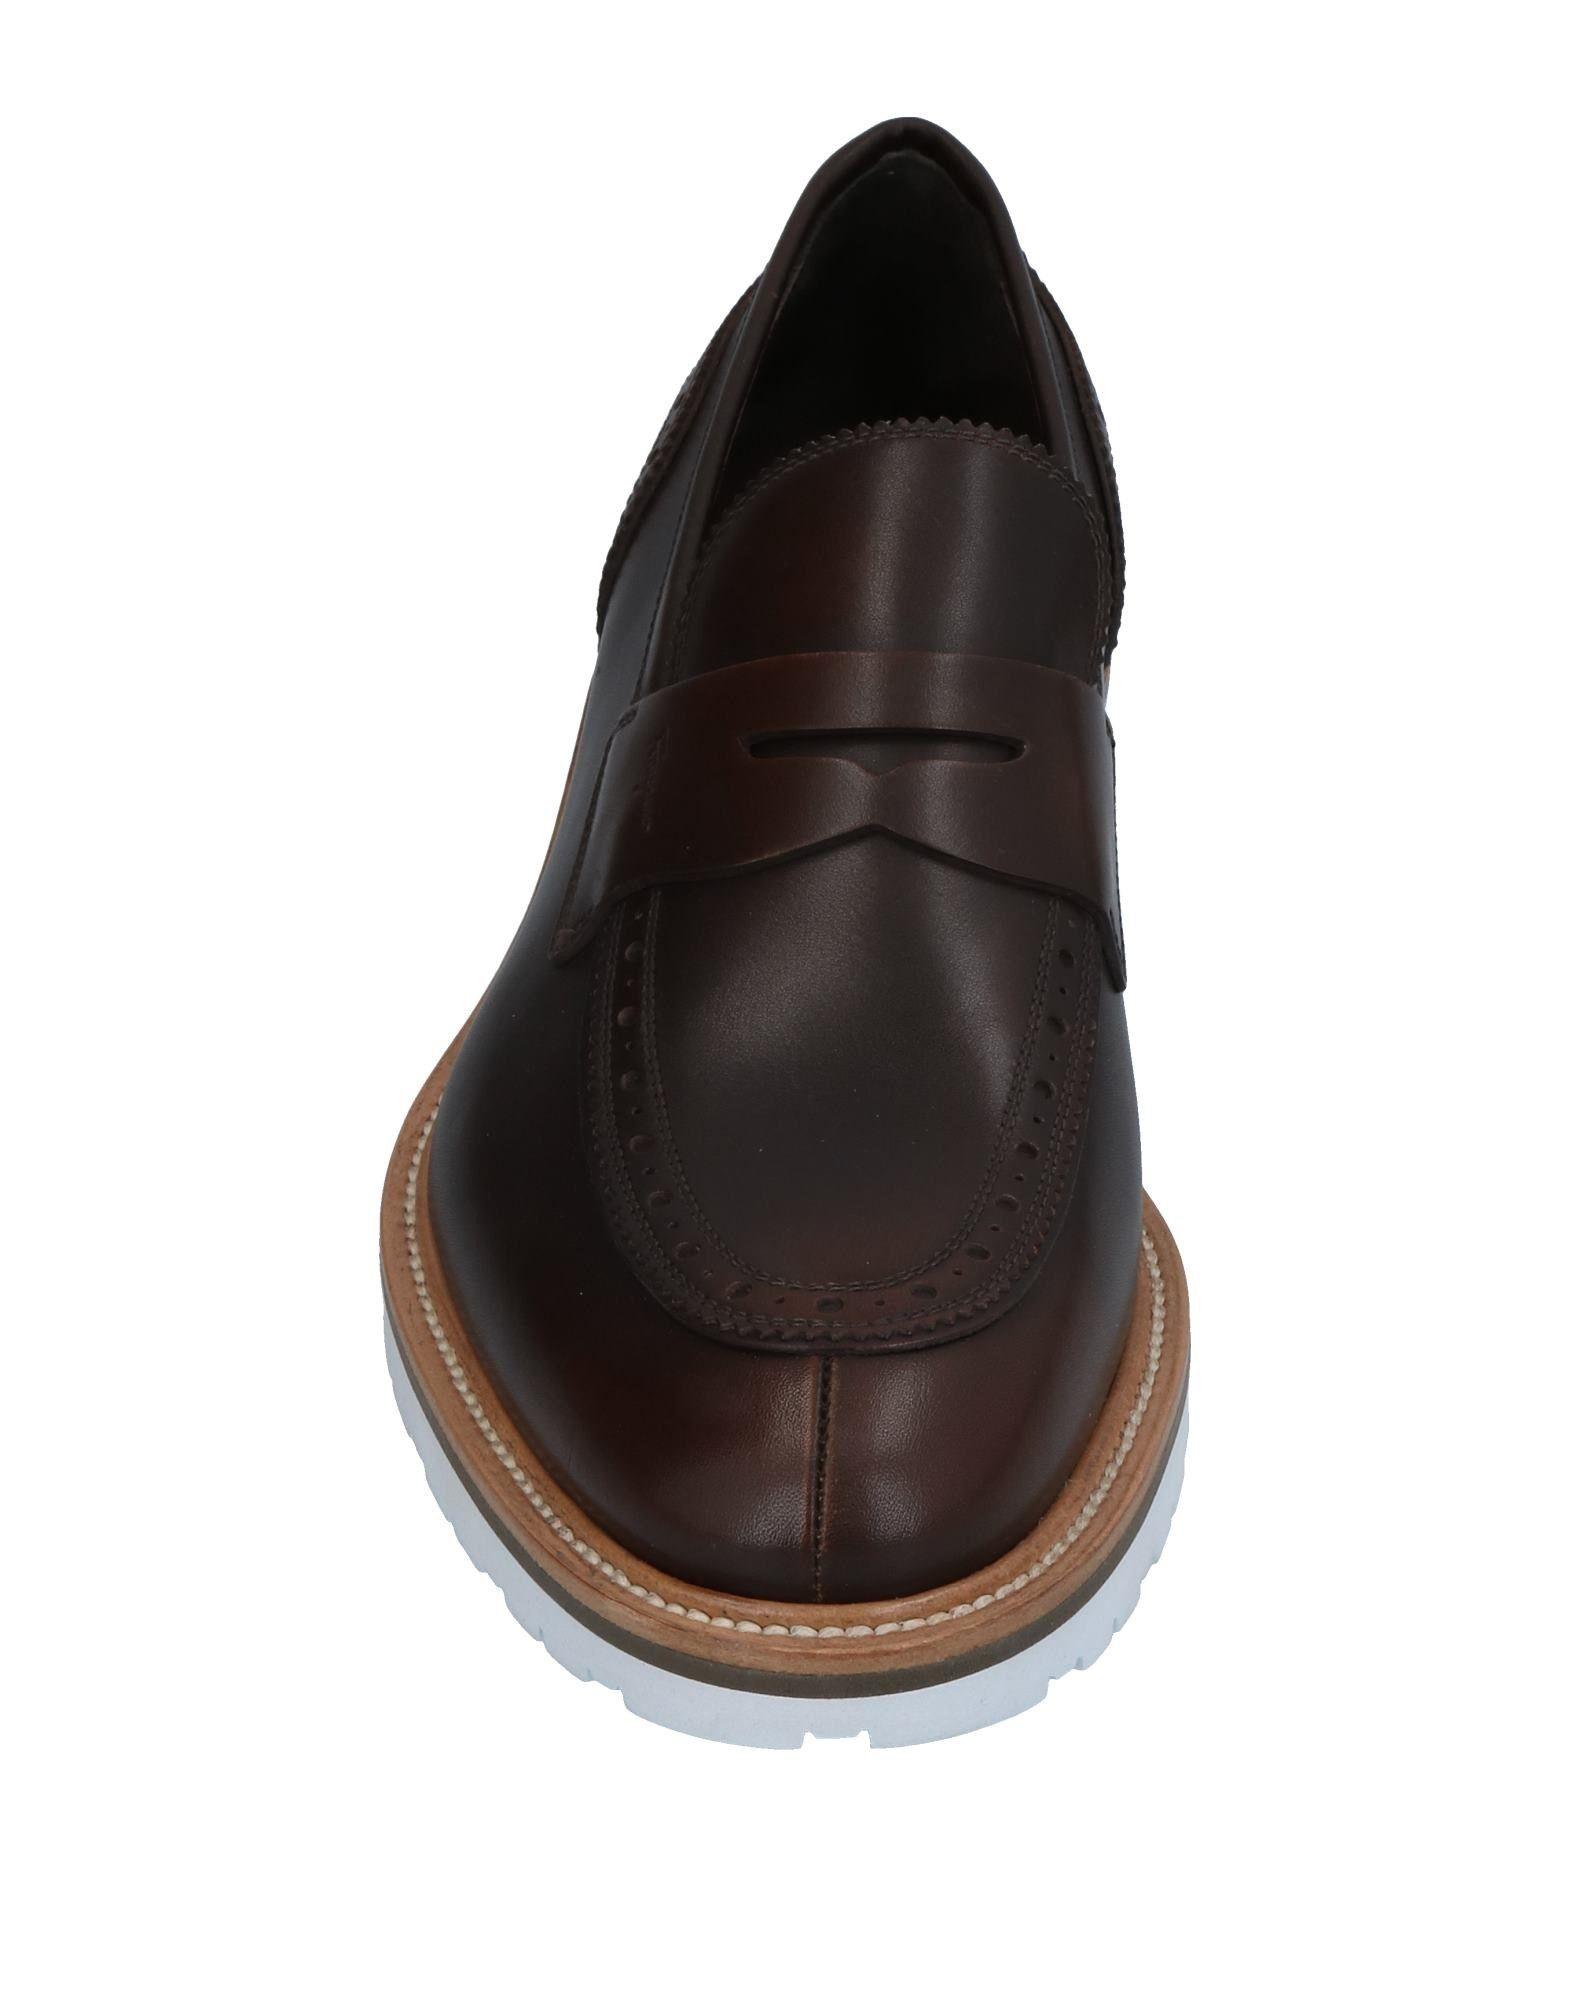 Salvatore Ferragamo Gute Mokassins Herren  11401352NW Gute Ferragamo Qualität beliebte Schuhe 025ba7